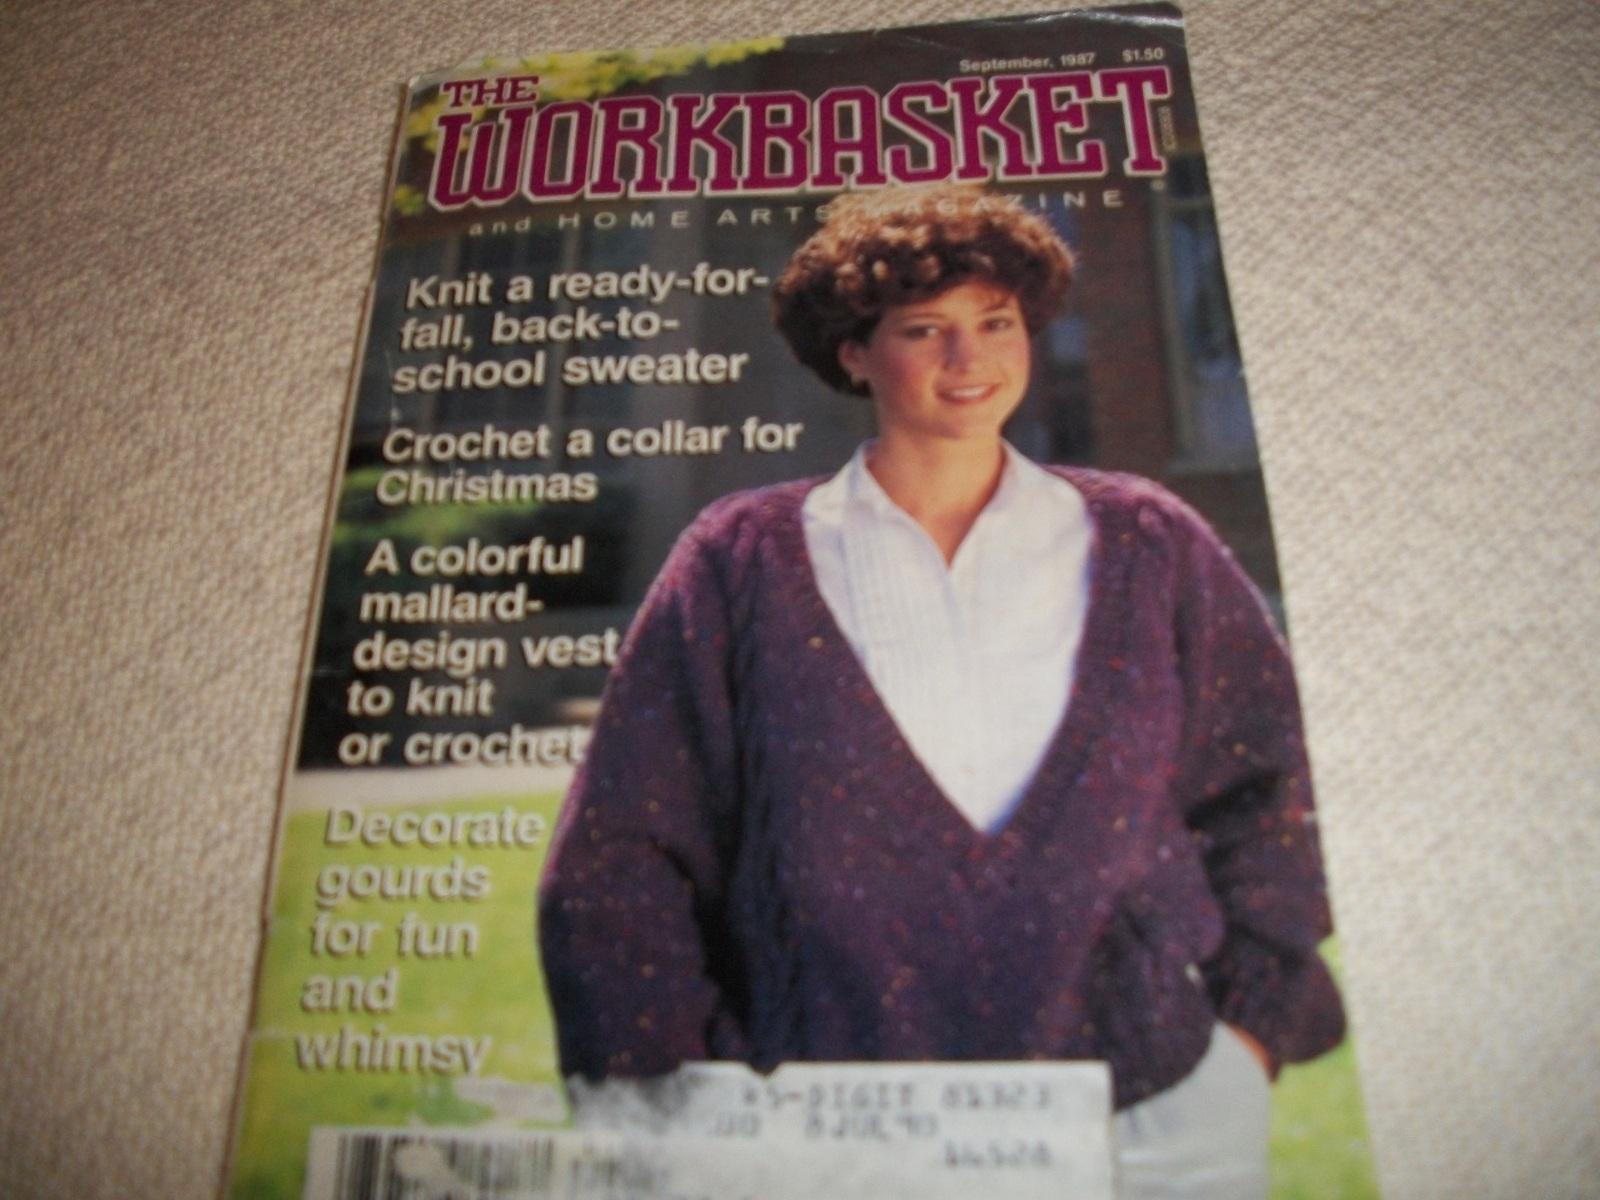 Workbasket Magazine September 1987 and 19 similar items